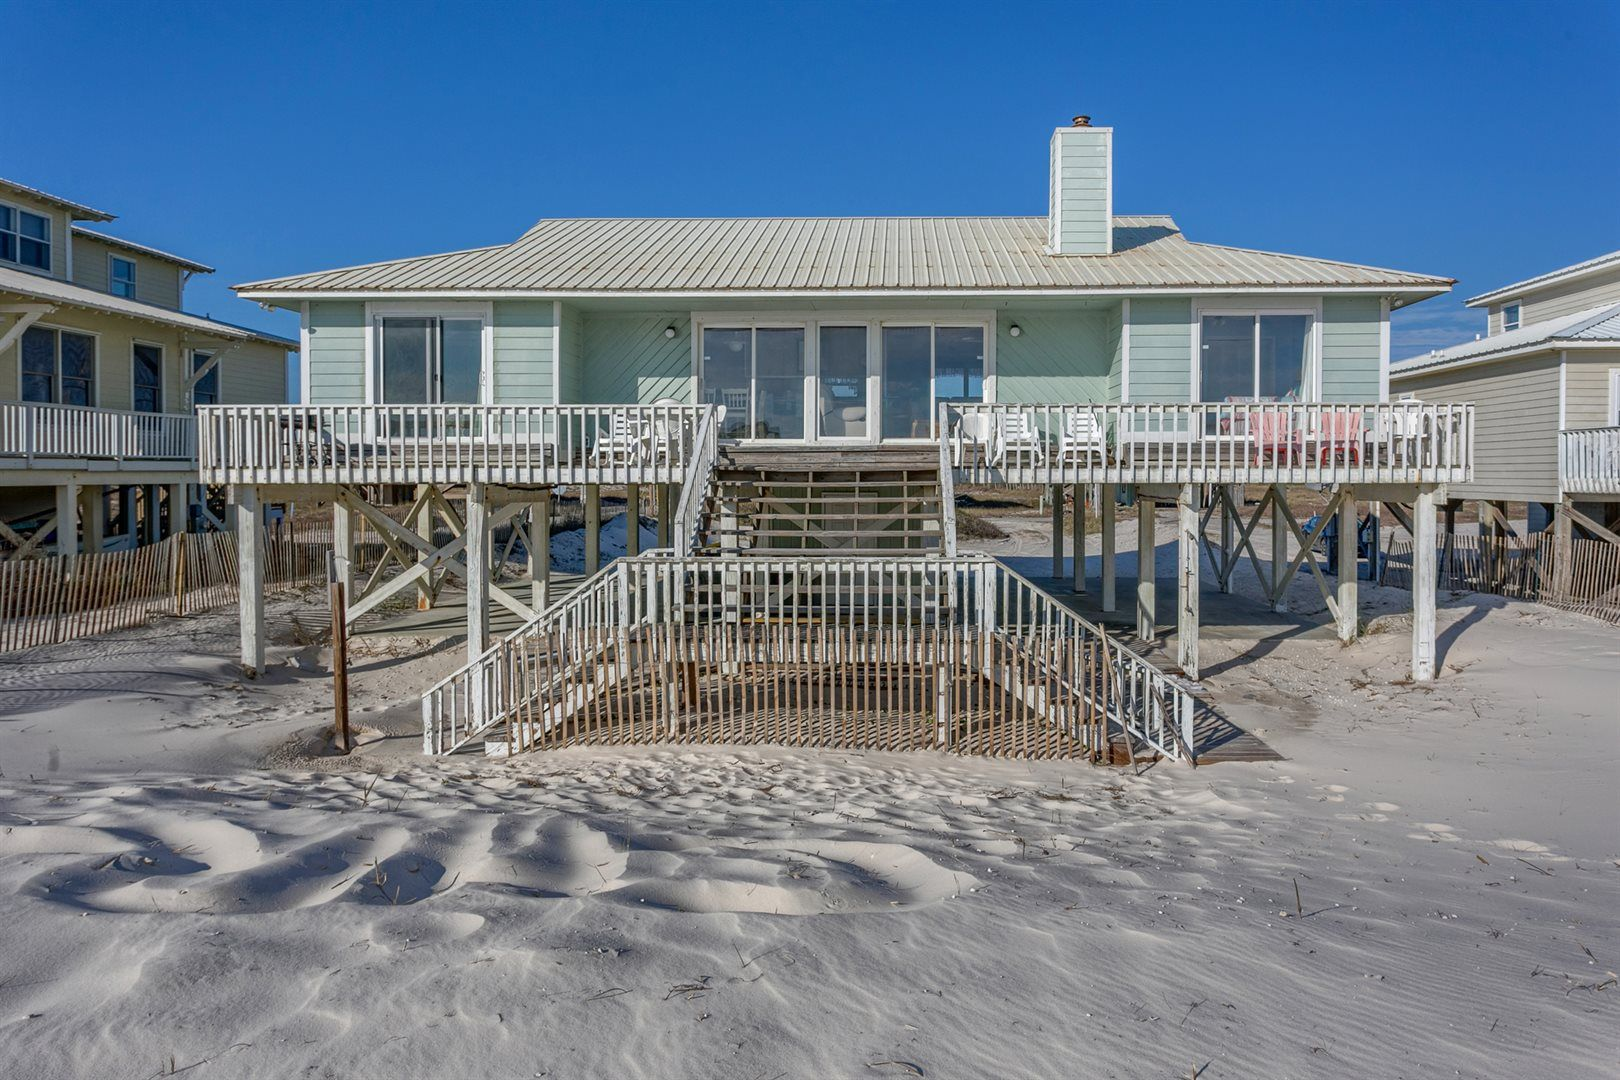 Barefoot beach fort vacation house rental meyer